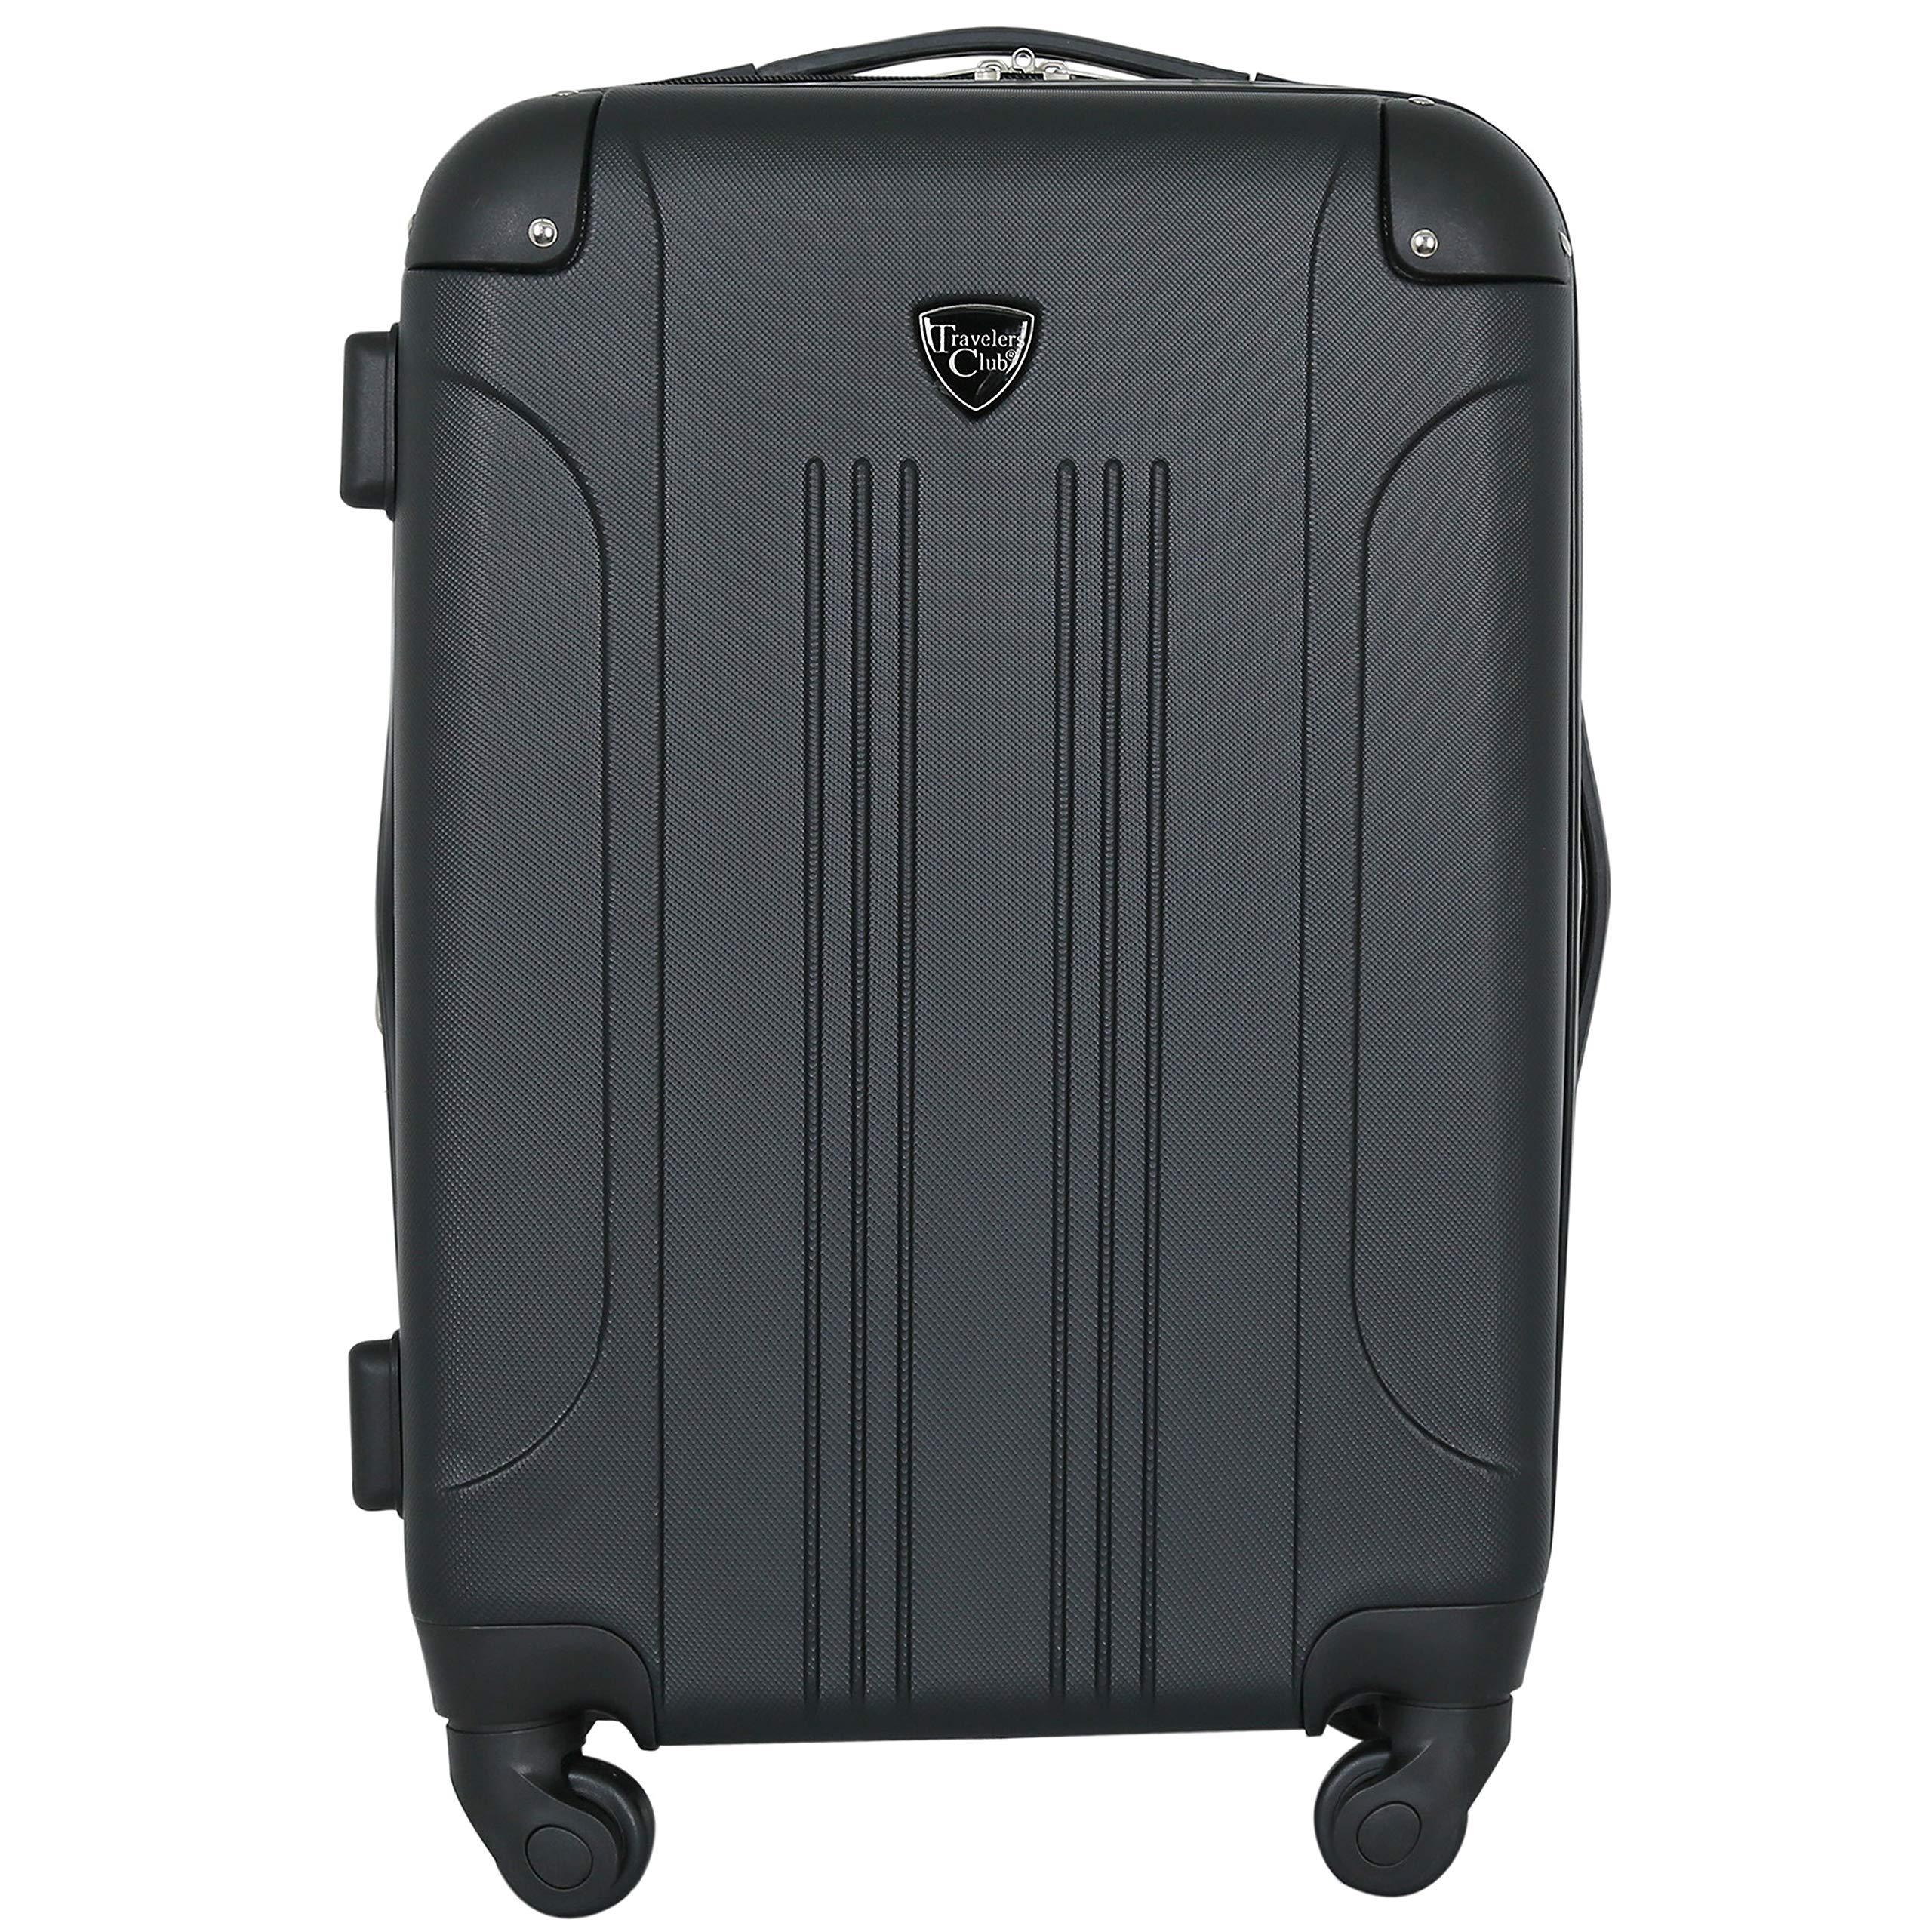 Travelers Club Expandable Hardside Mobility